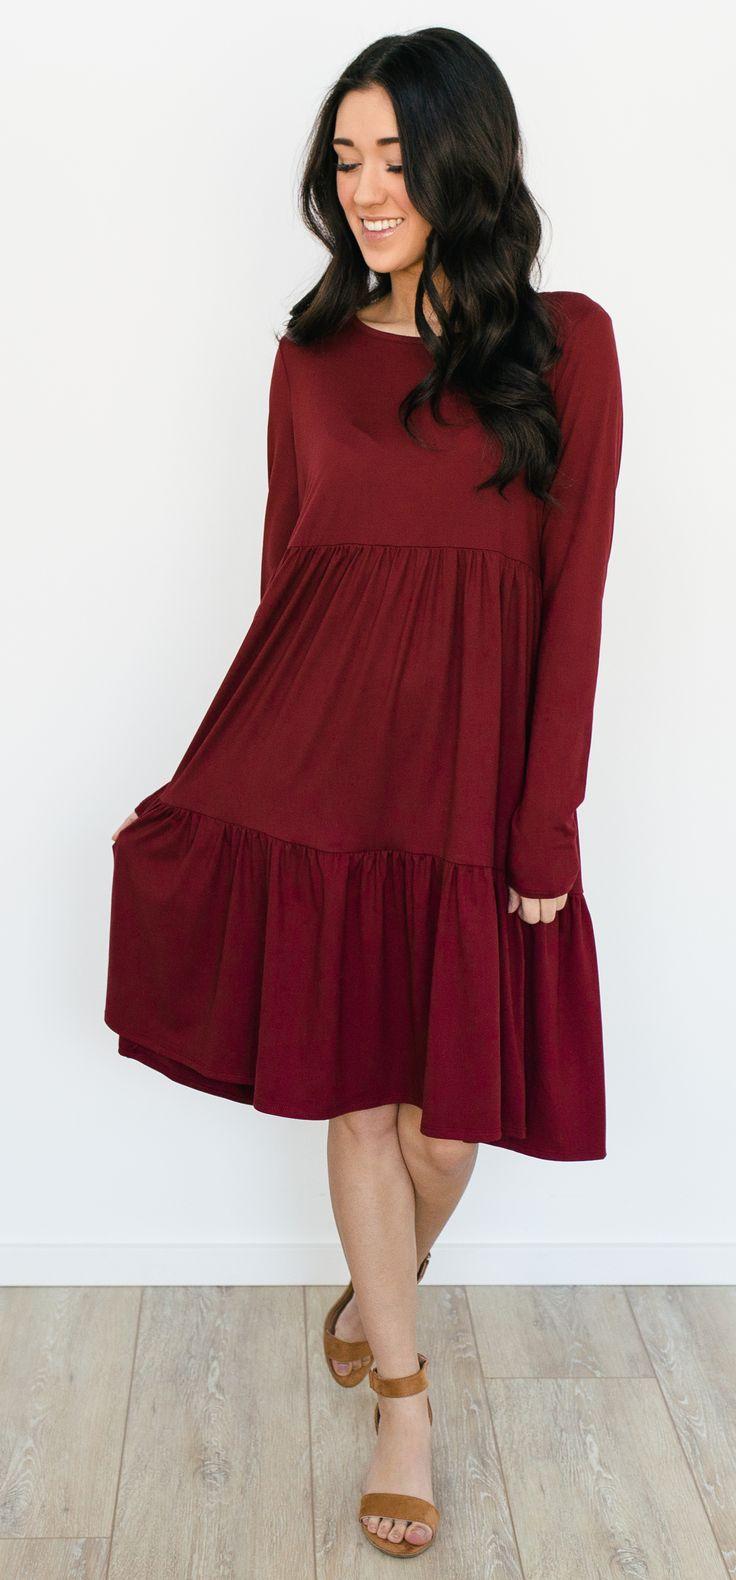 Miller Tiered Dress - Wine